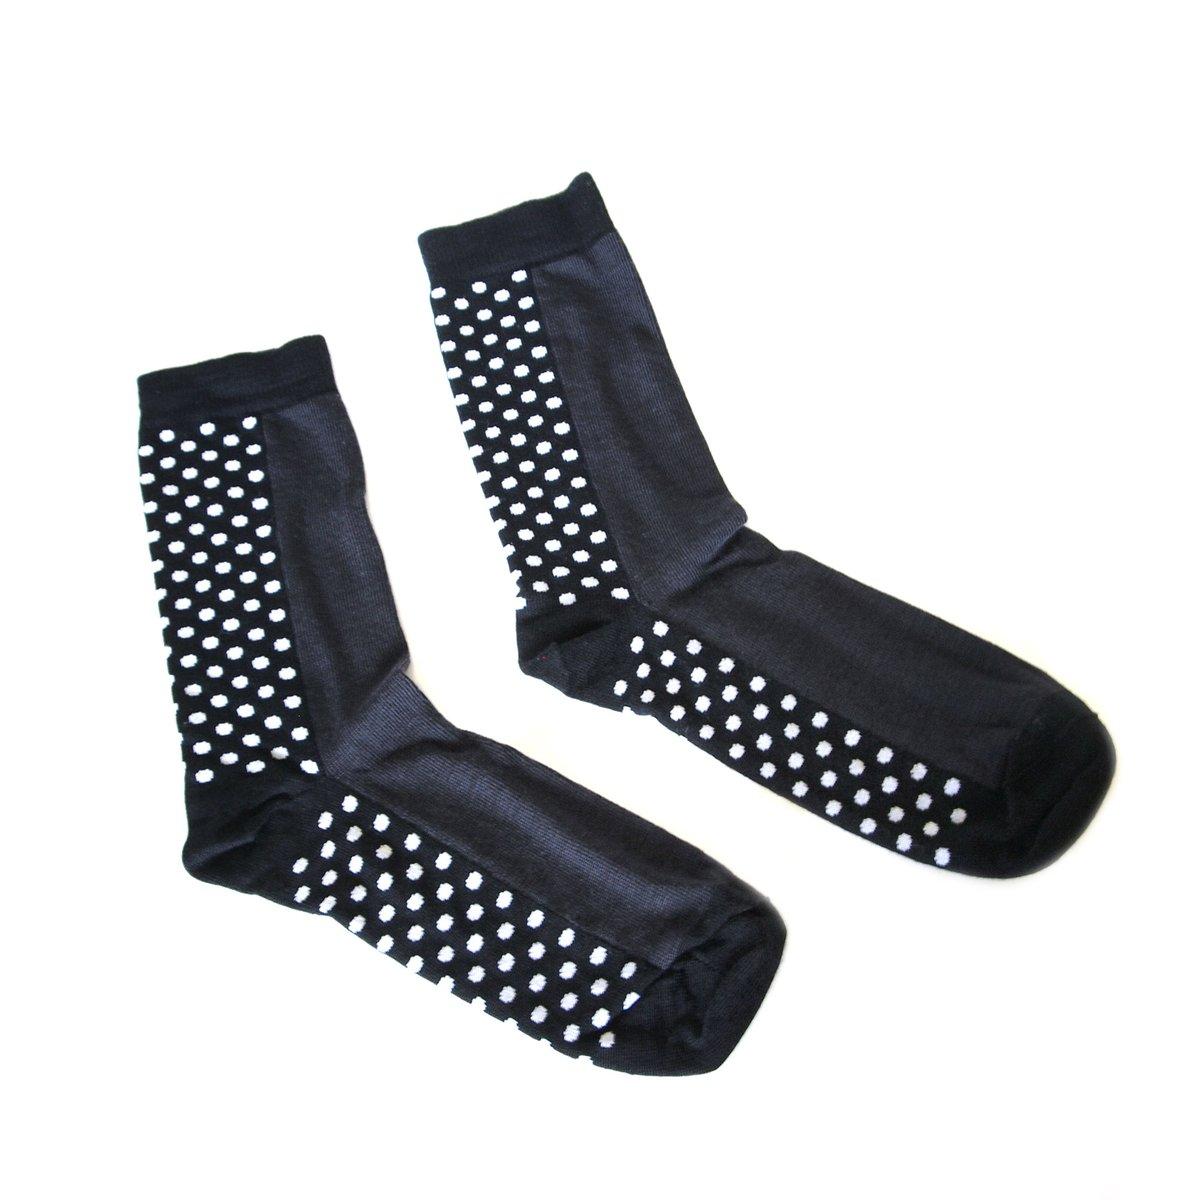 Image of ON THE SPOTS Socks - Grey